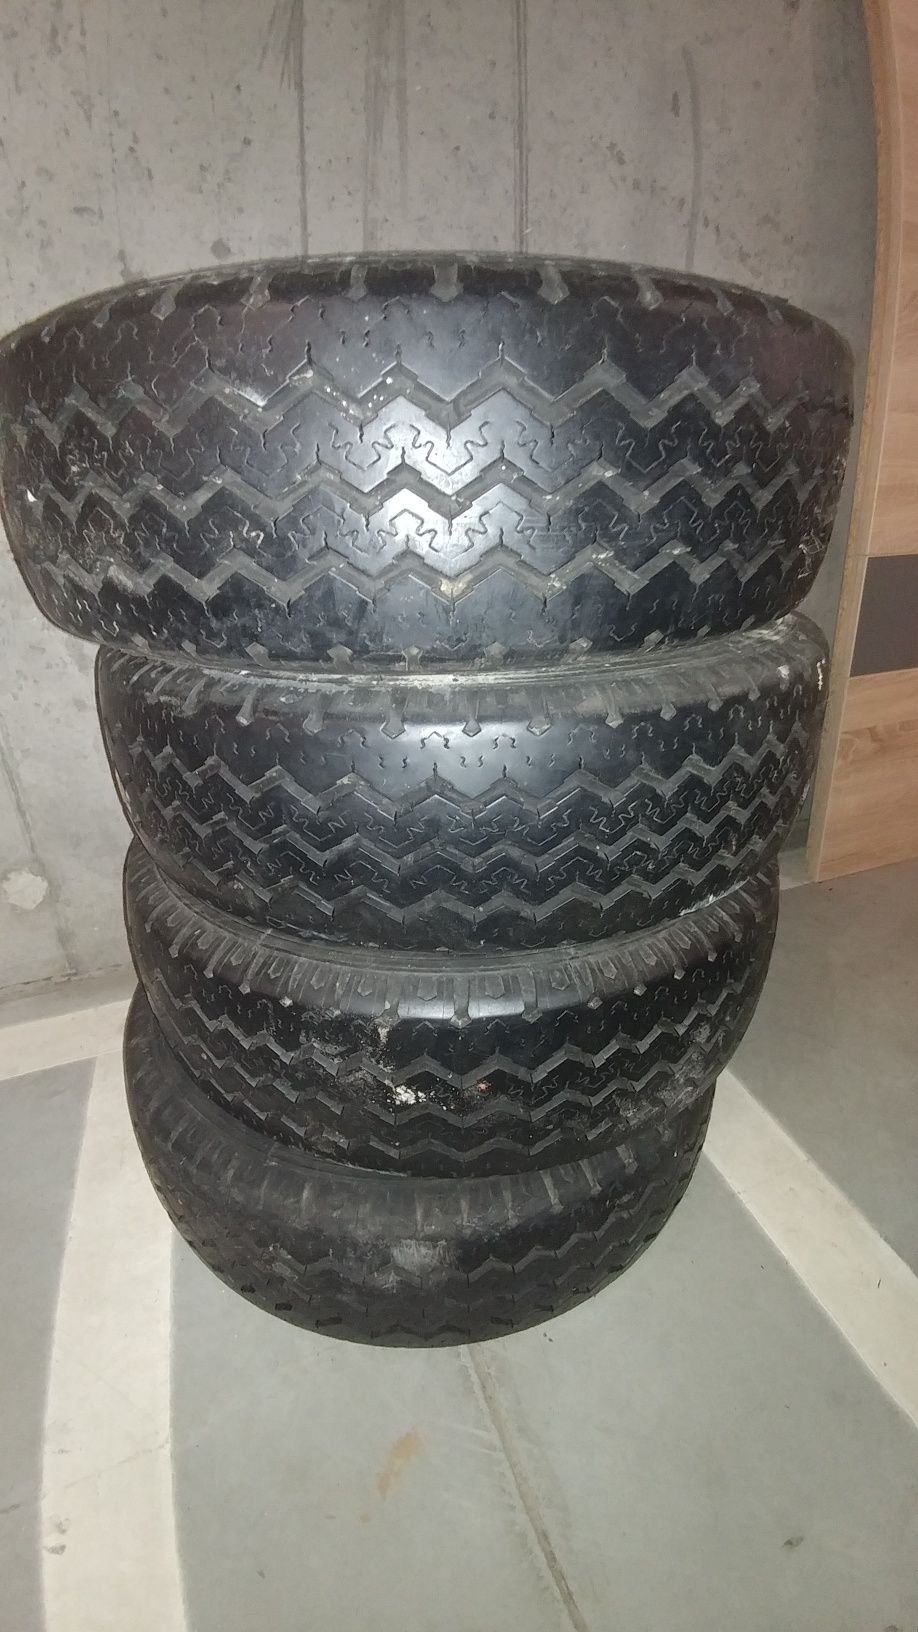 Opony Citroen Jumper 215/70/R15 na 195/75/R16C